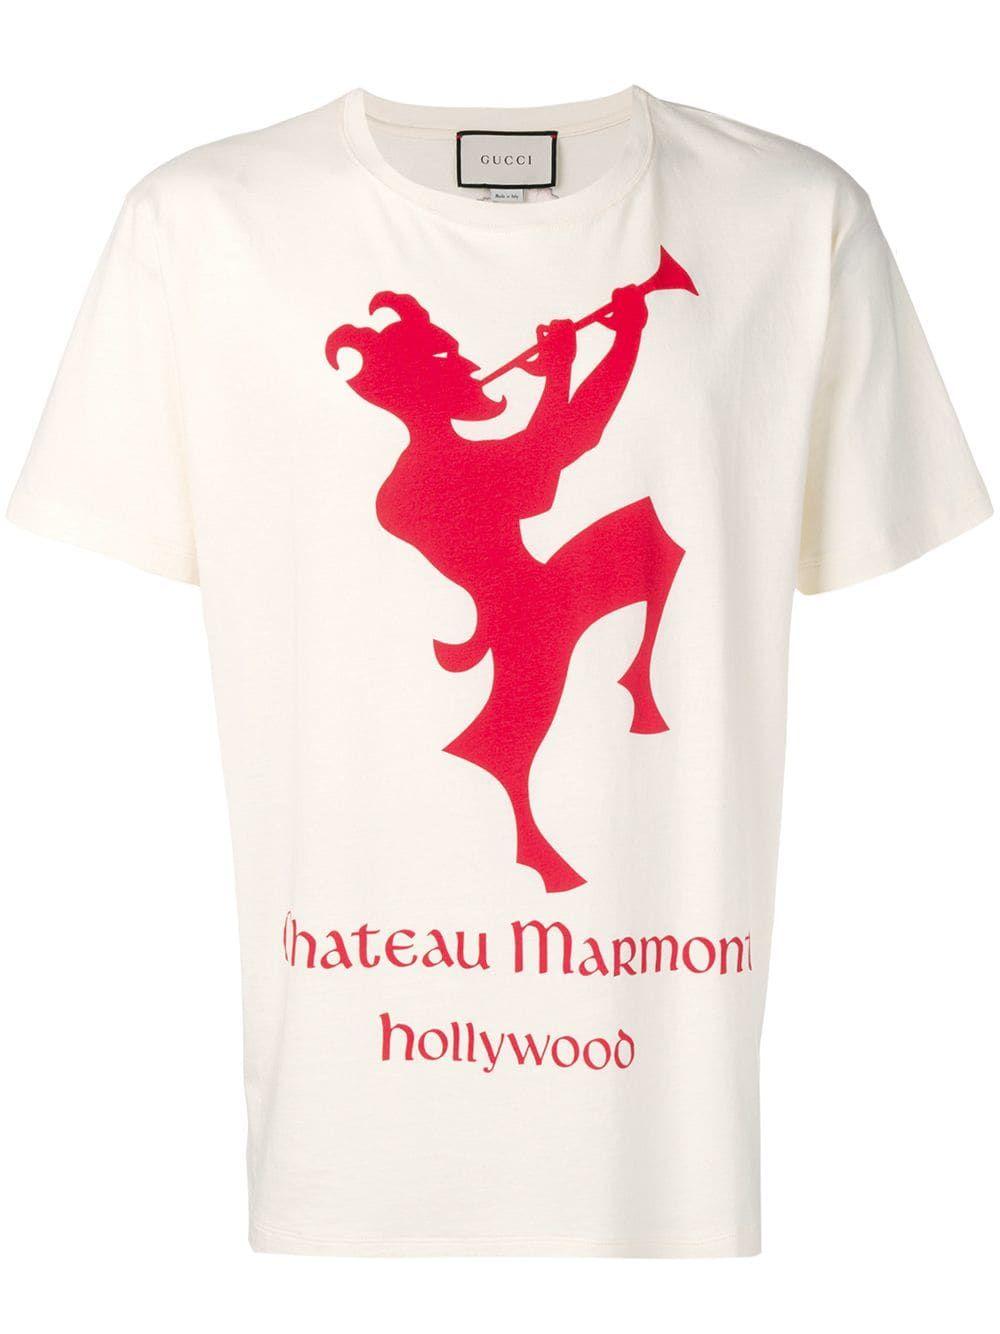 75102066b GUCCI MEN'S CHATEAU MARMONT T-SHIRT. #gucci #cloth | Gucci in 2019 ...